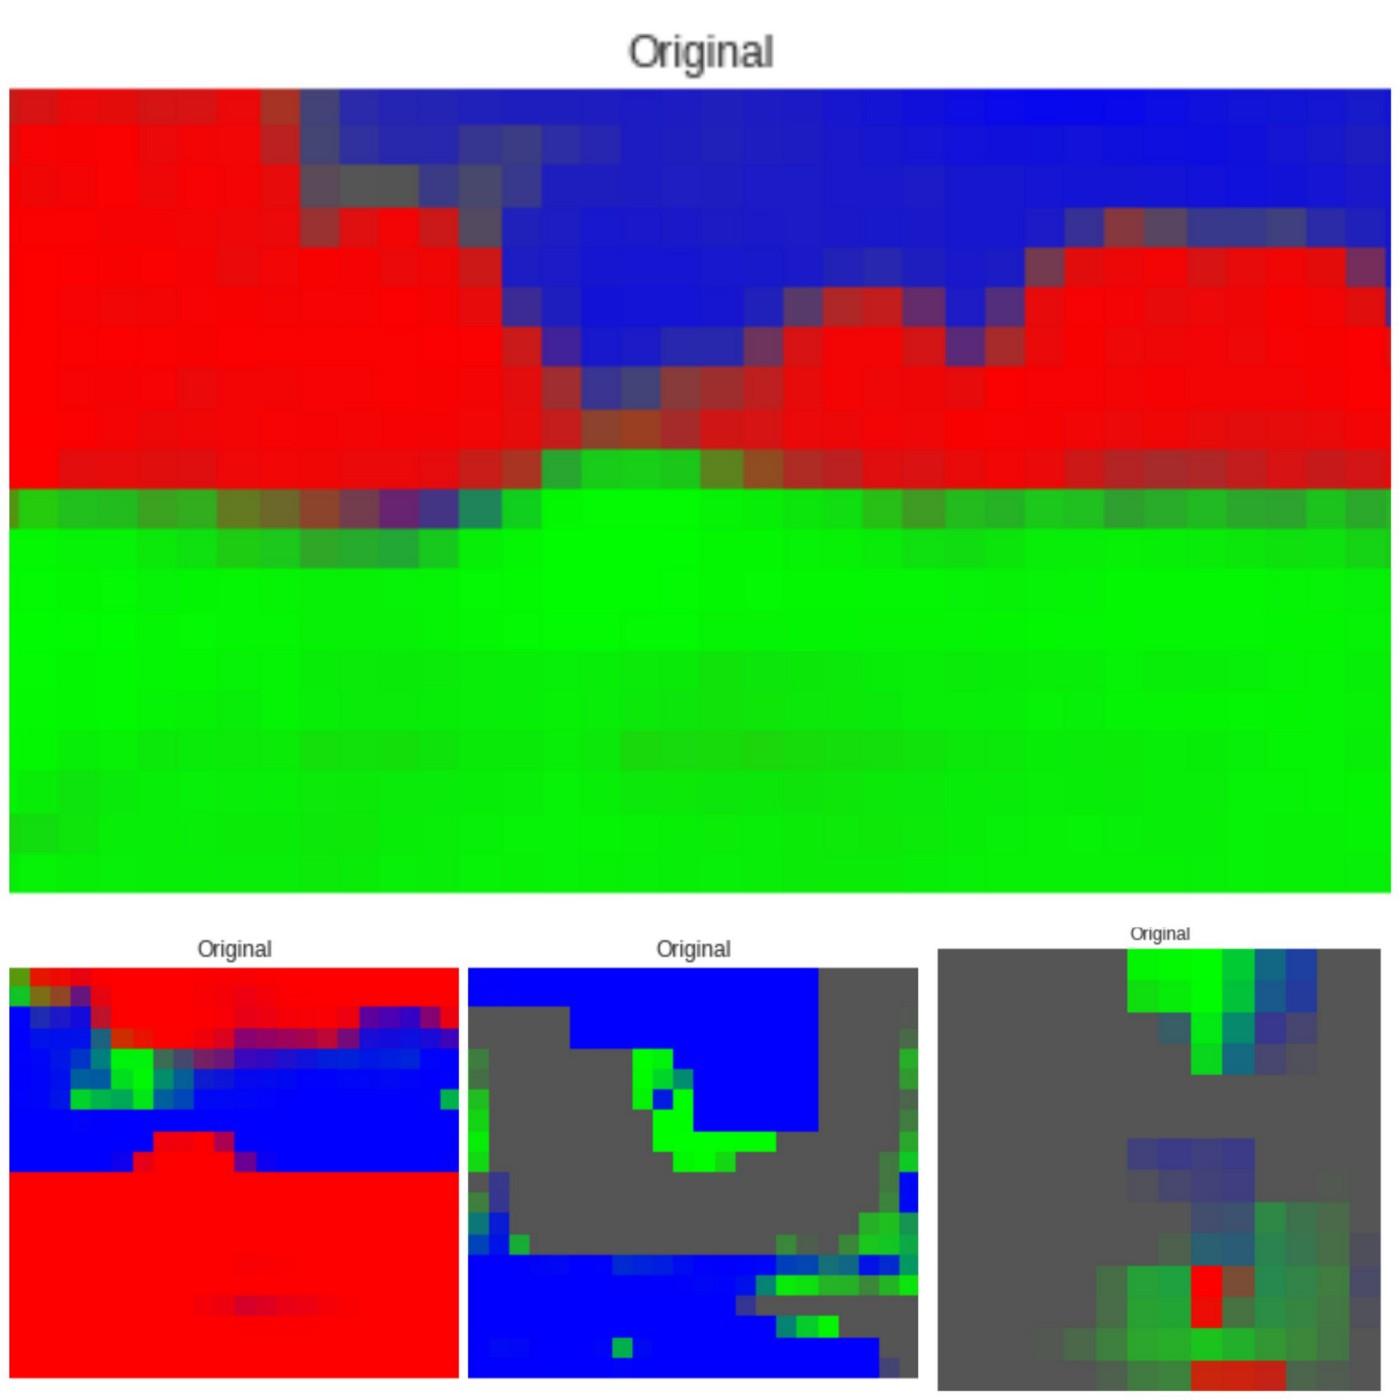 /image-to-image-translation-and-segmentation-tutorial-j1jq32dd feature image